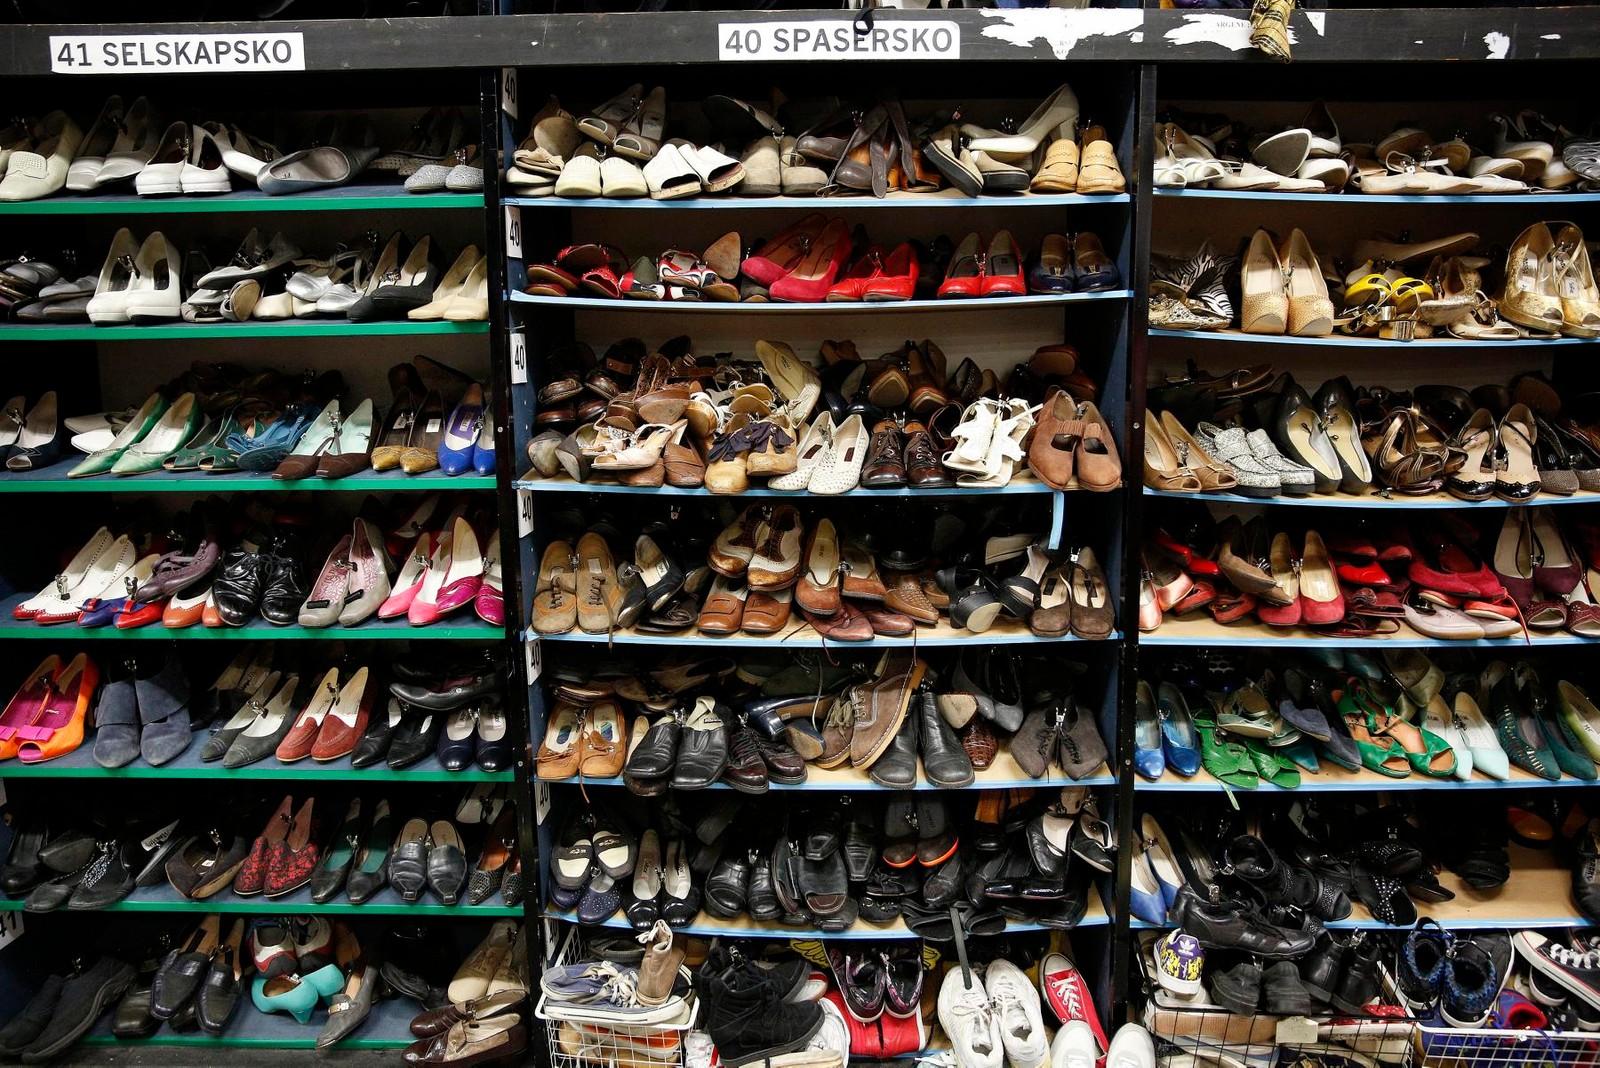 Kostymelageret har 8.000 par med sko.